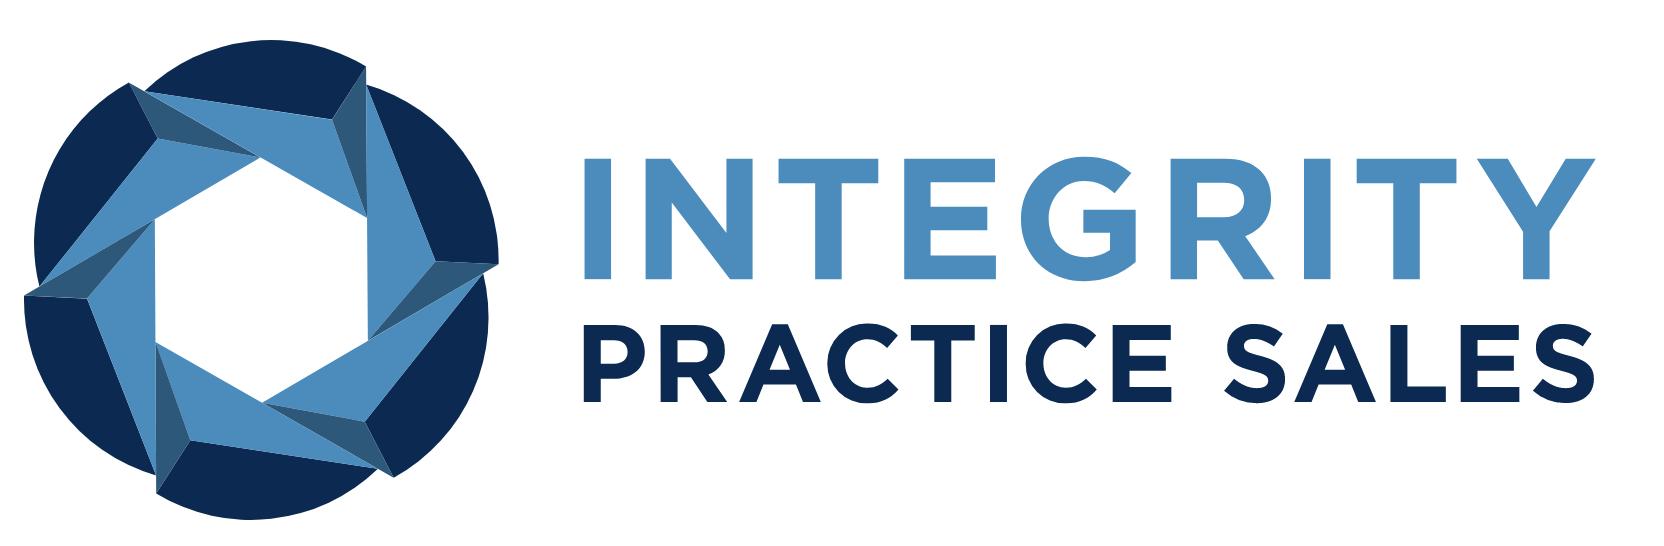 Integrity Practice Sales